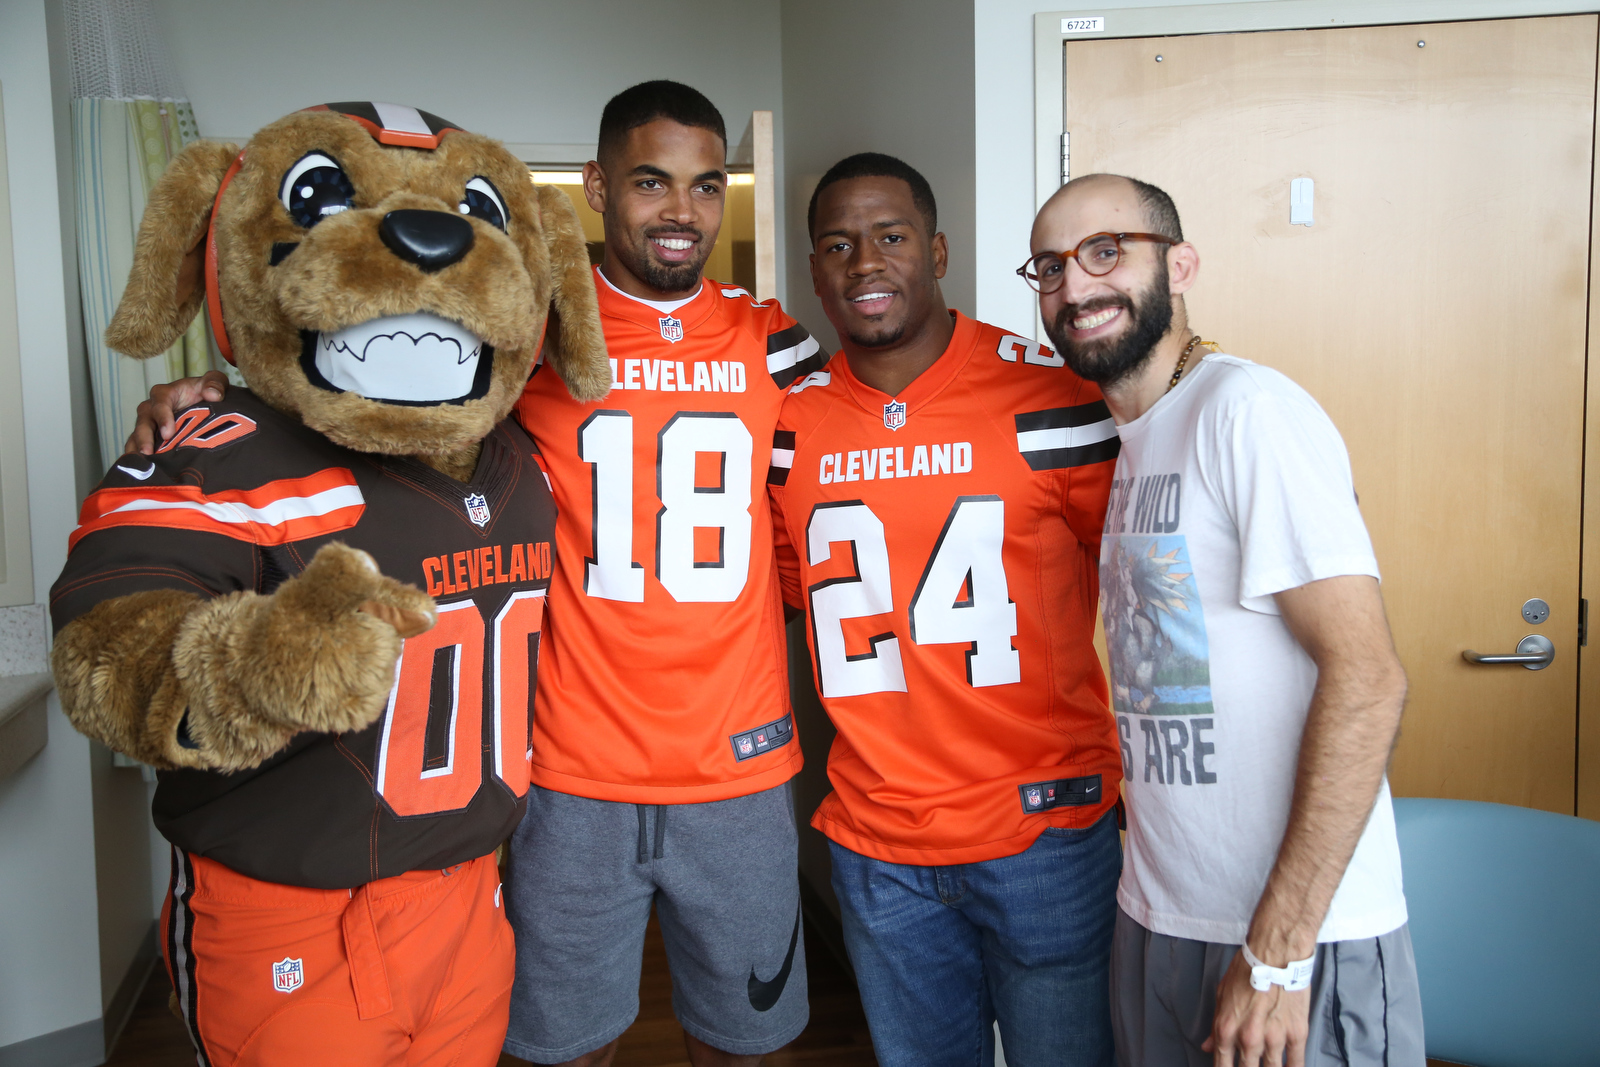 Browns players visit cancer patients at University Hospitals Seidman Cancer Center